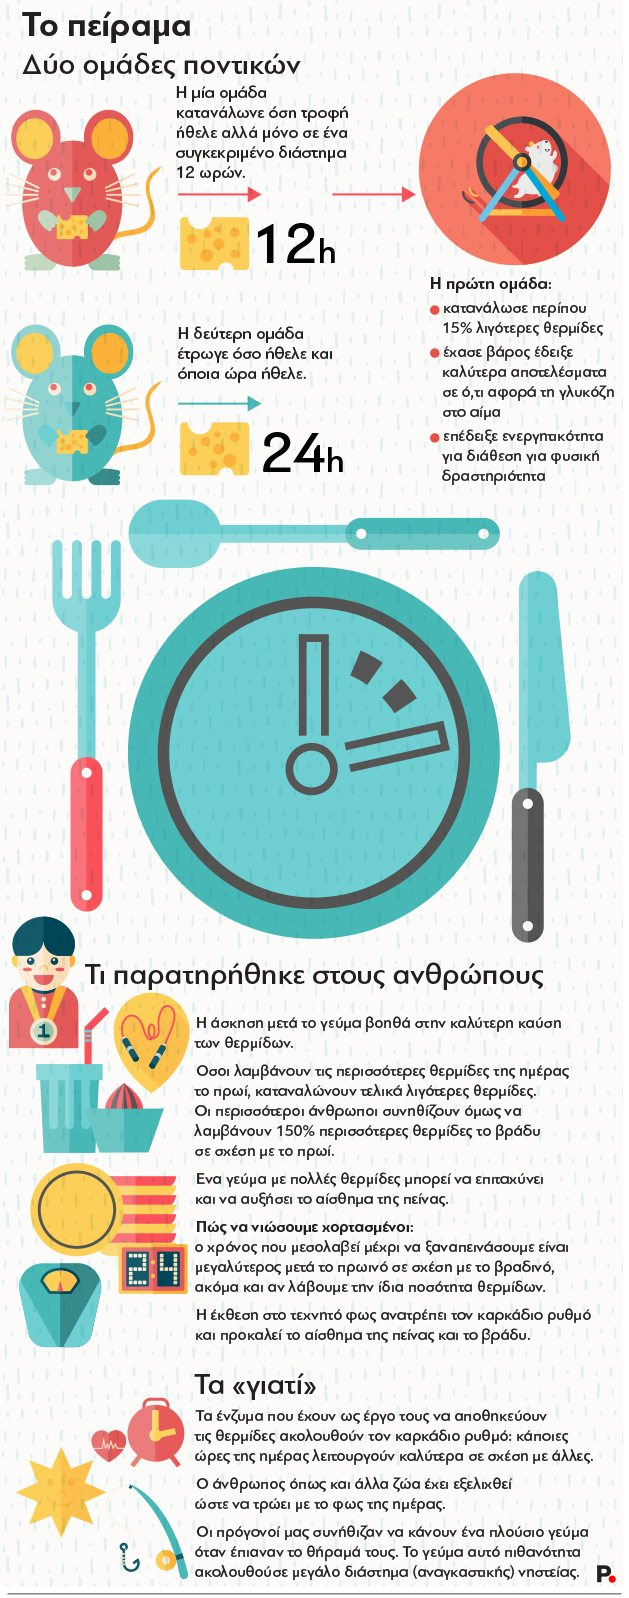 Fitness_24h-eat_Protagon